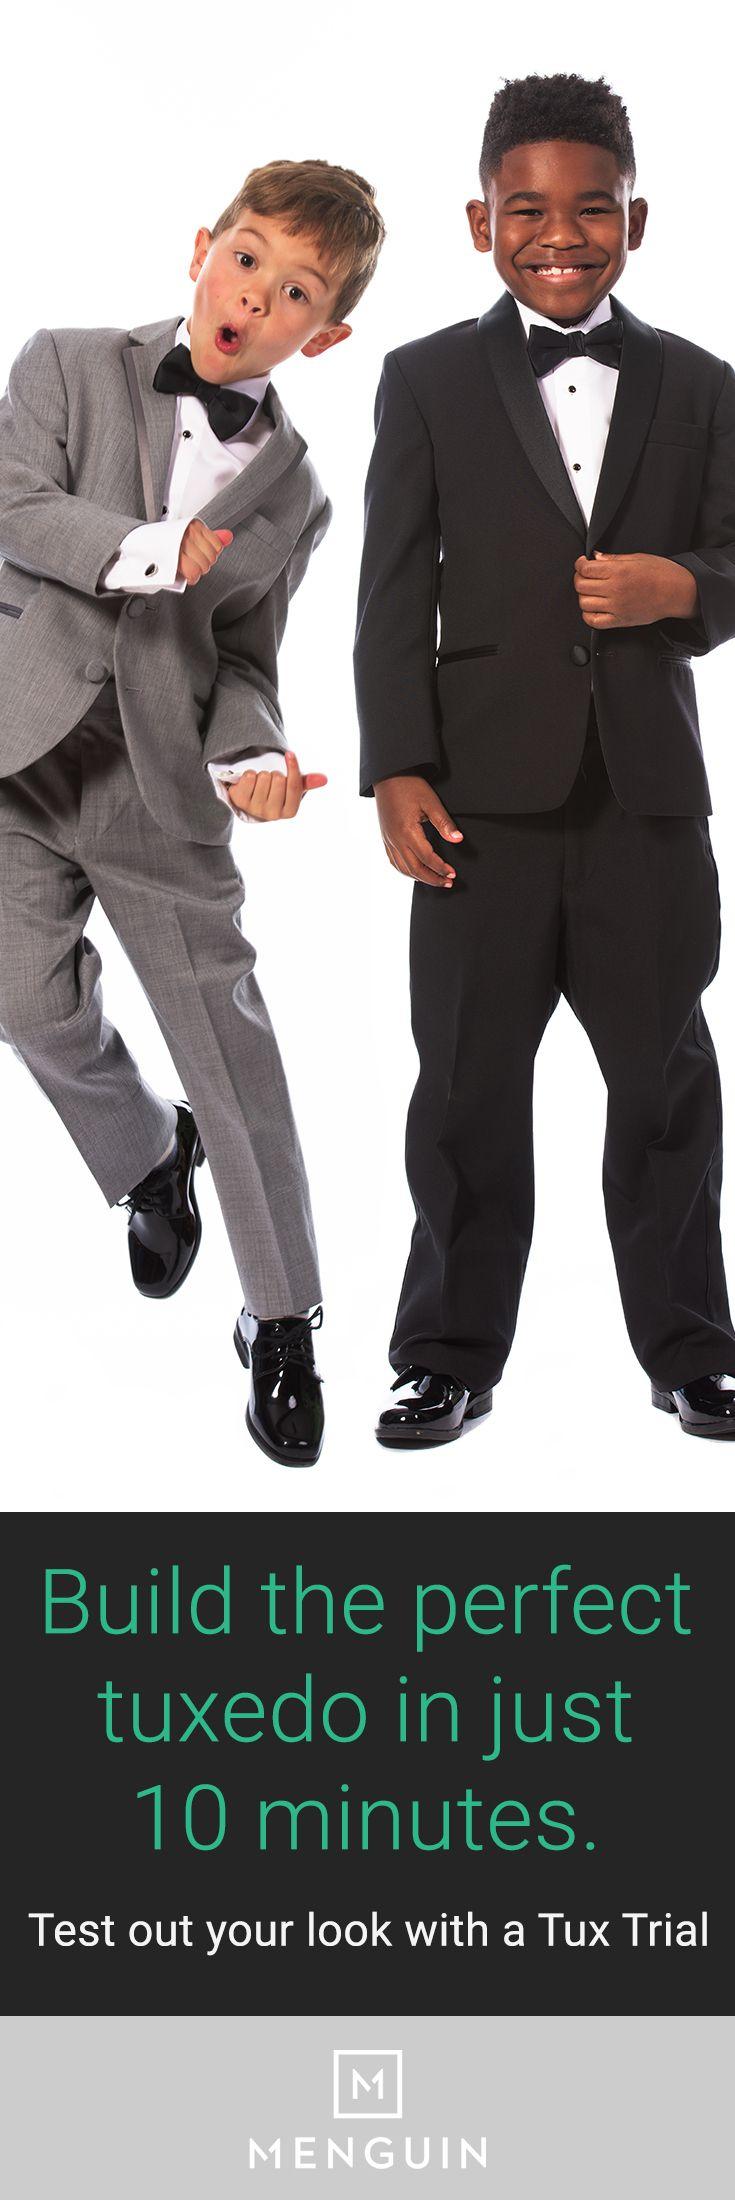 316 best Tuxedo Rental images on Pinterest | Tuxedo wedding ...